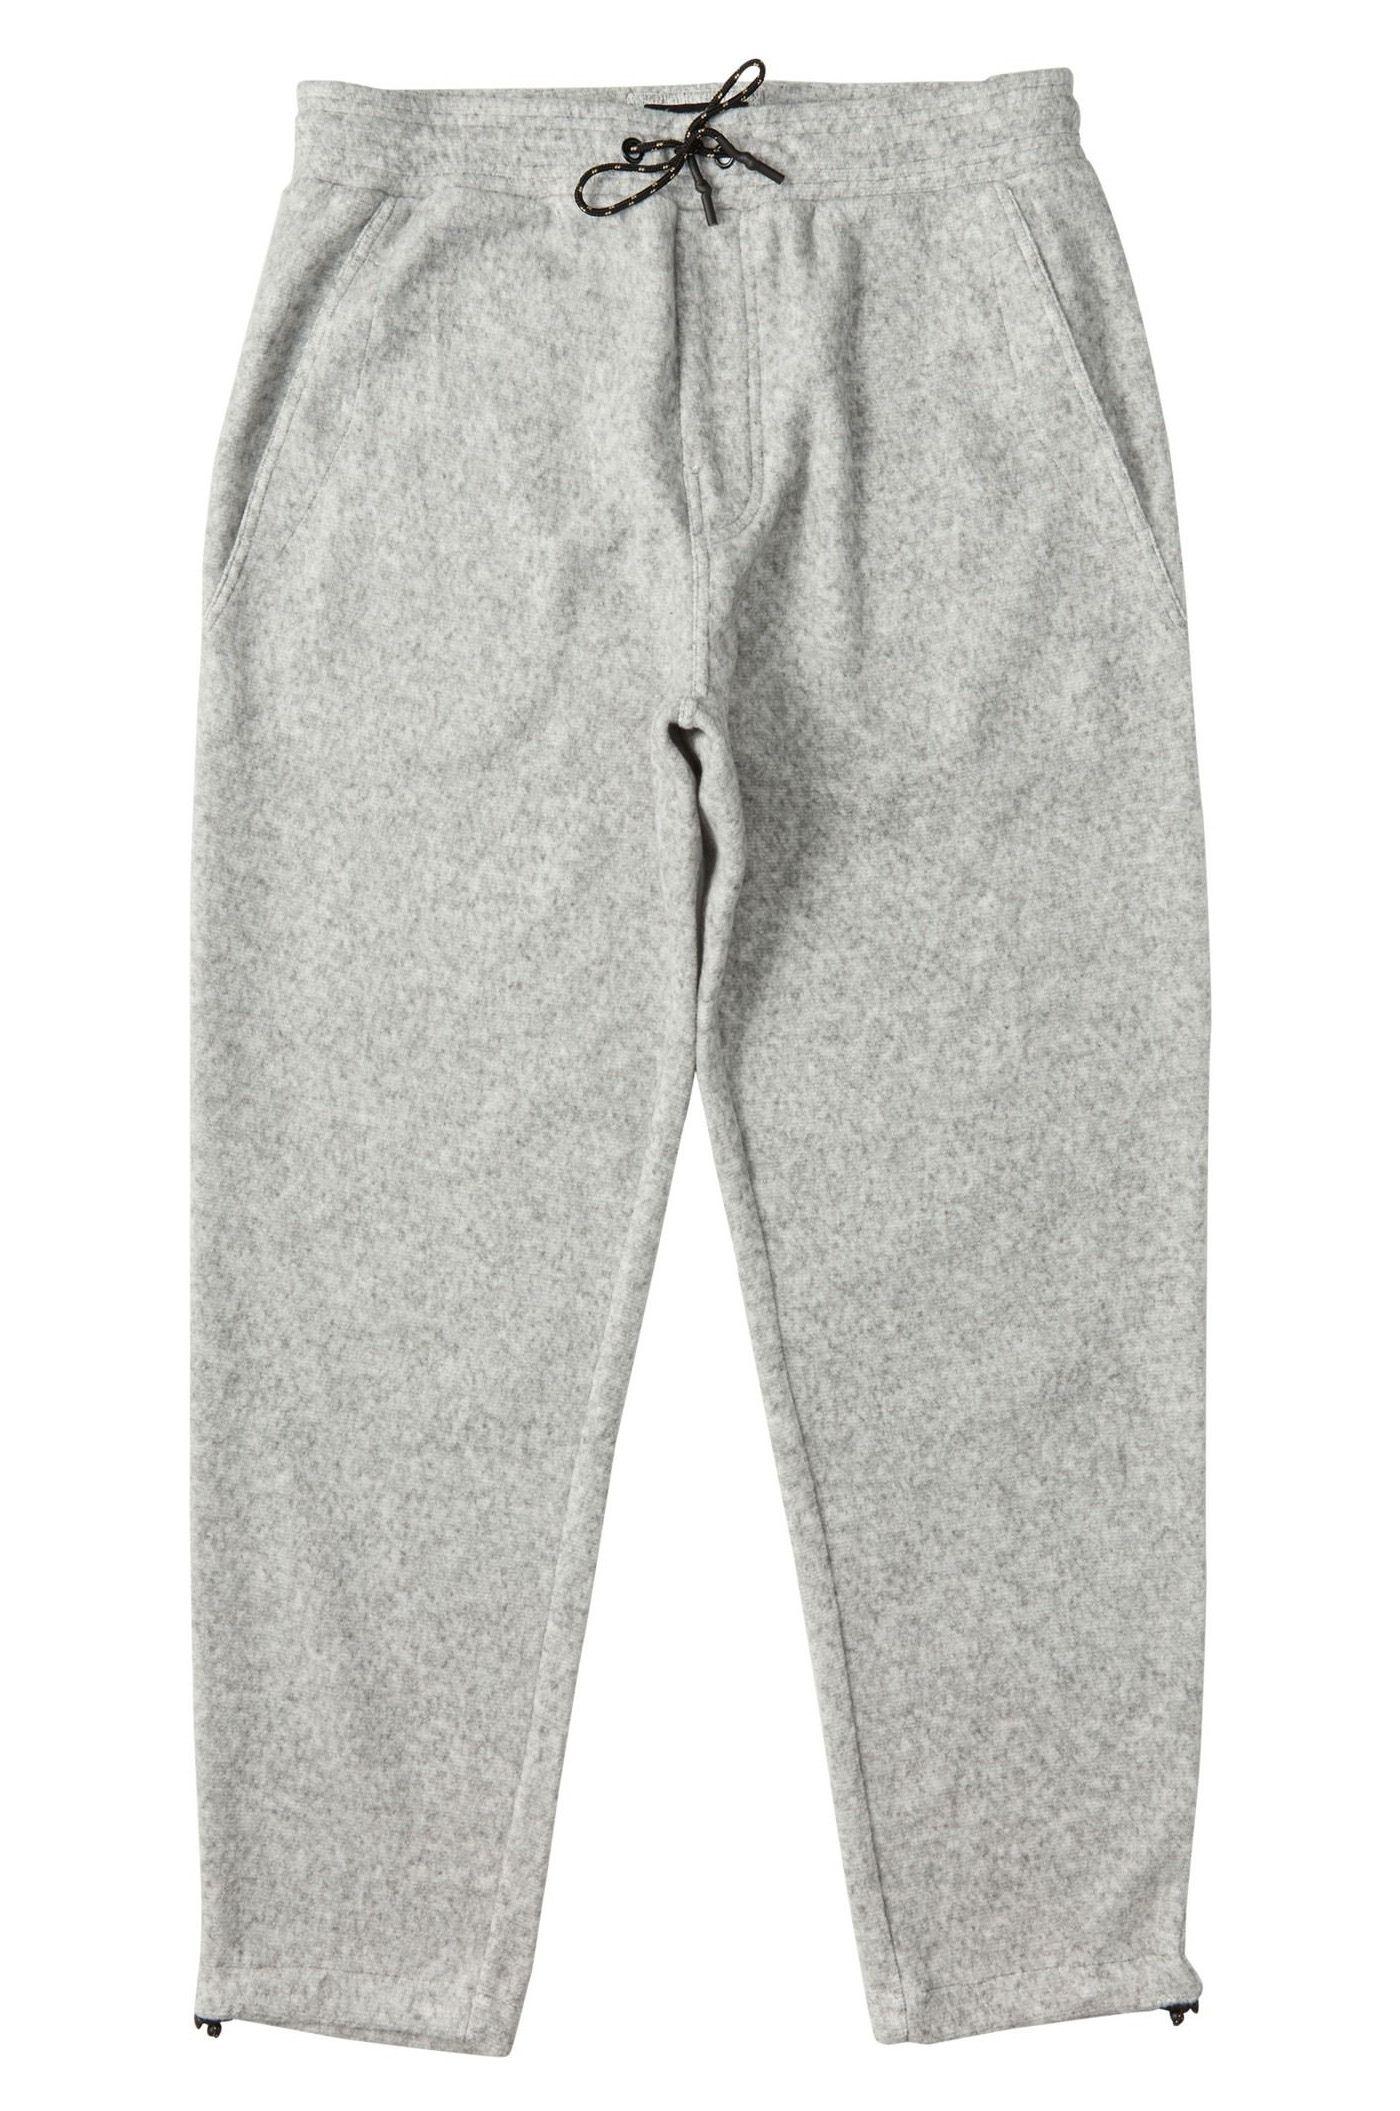 Billabong Pants BOUNDARY PANT ADVENTURE DIVISION Light Grey